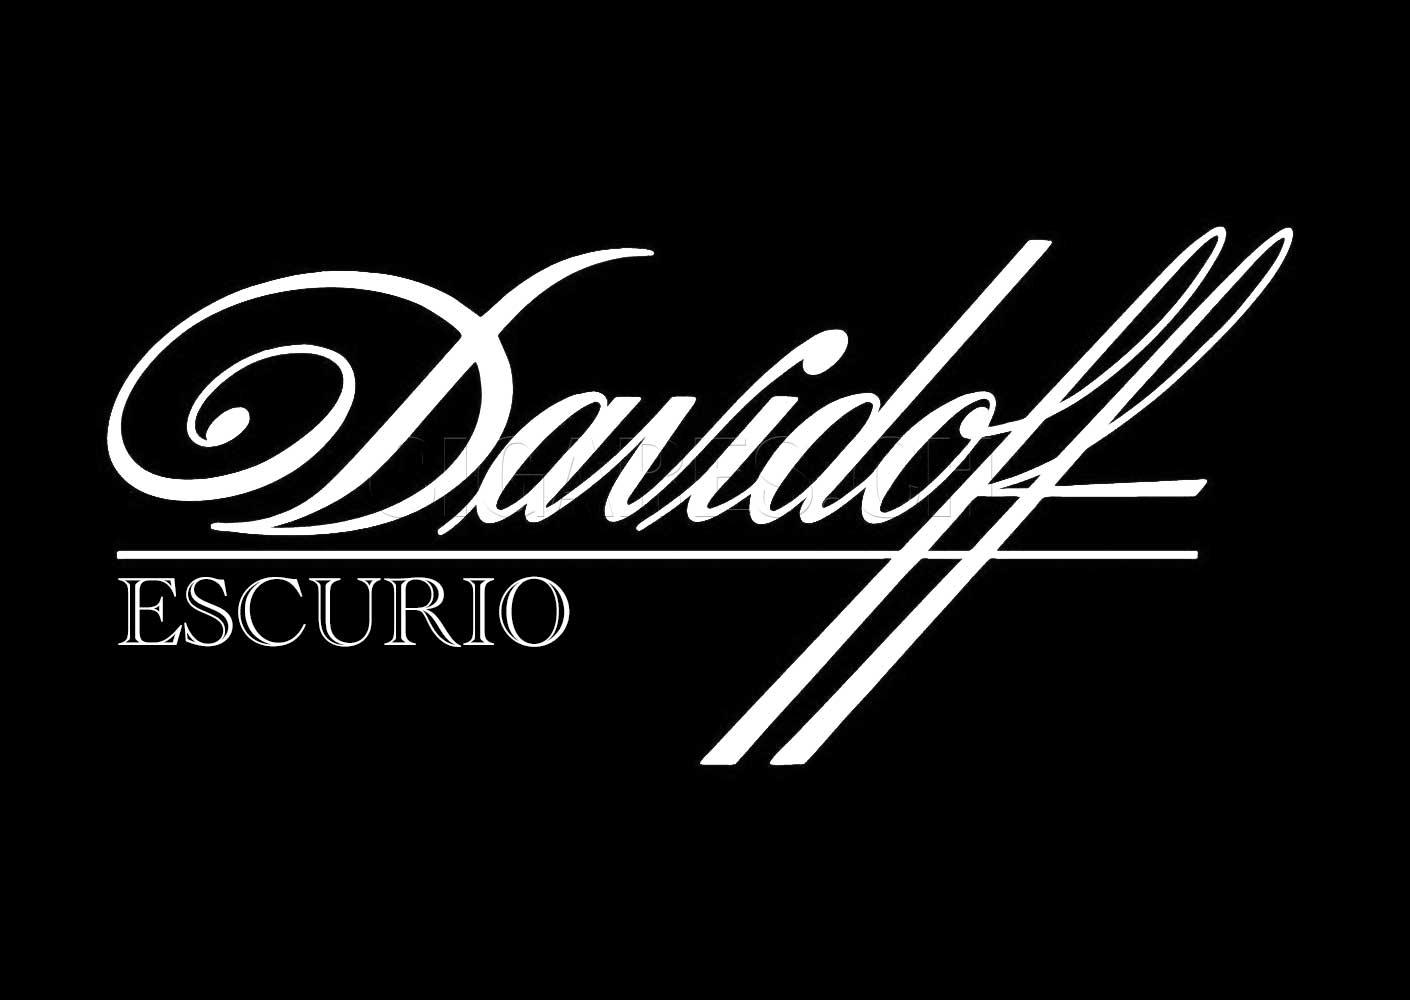 Escurio